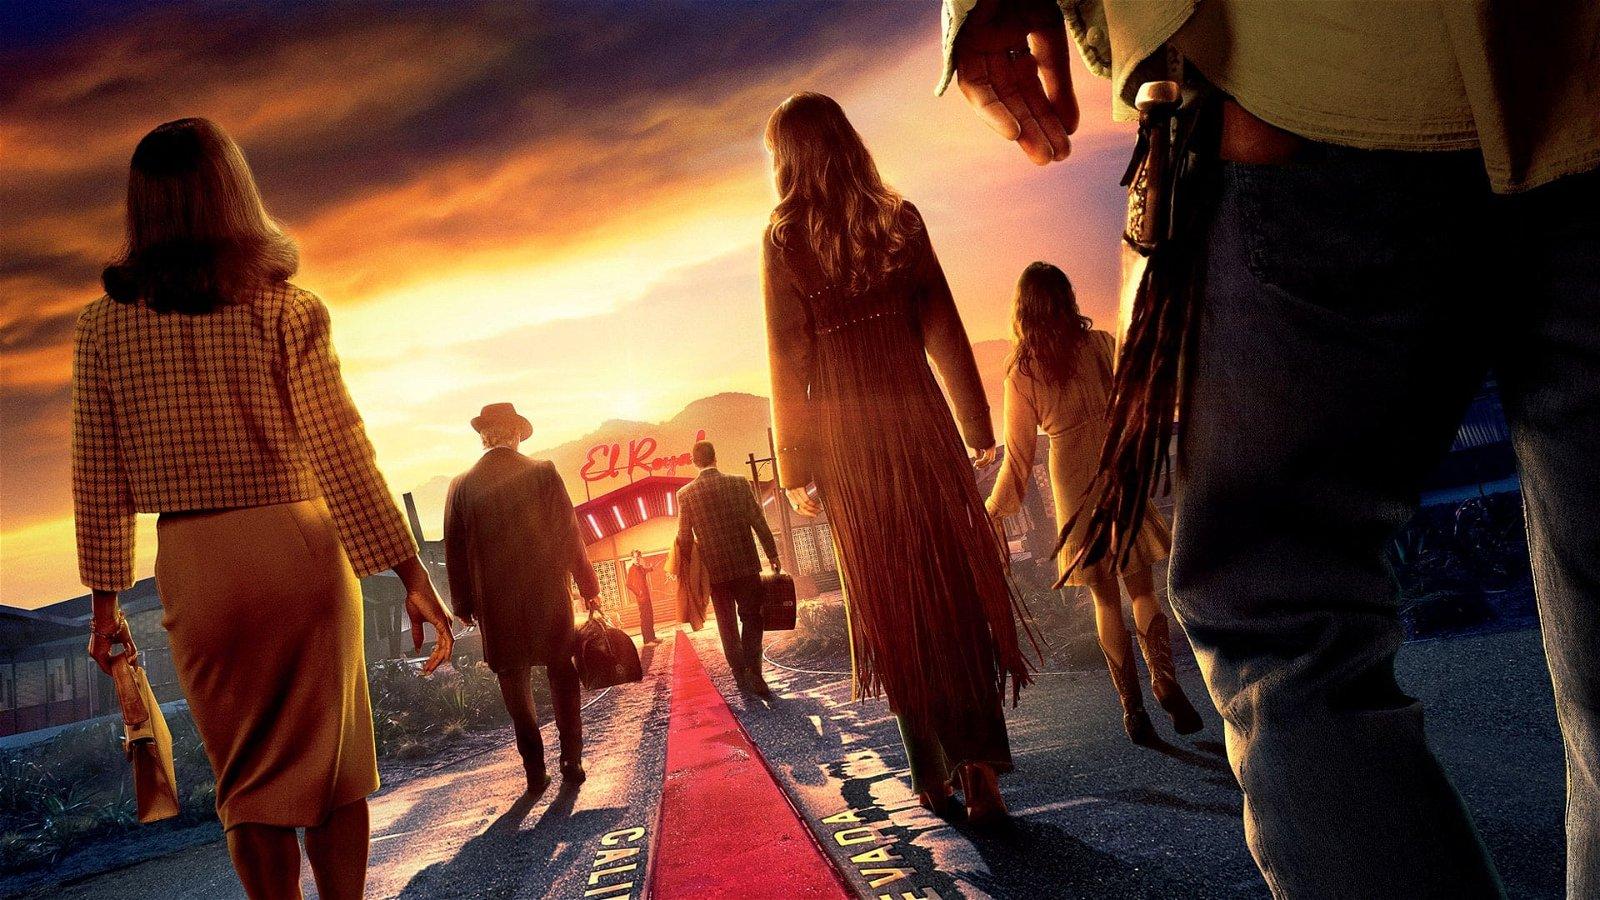 Bad Times at the El Royale (2018) Review 3